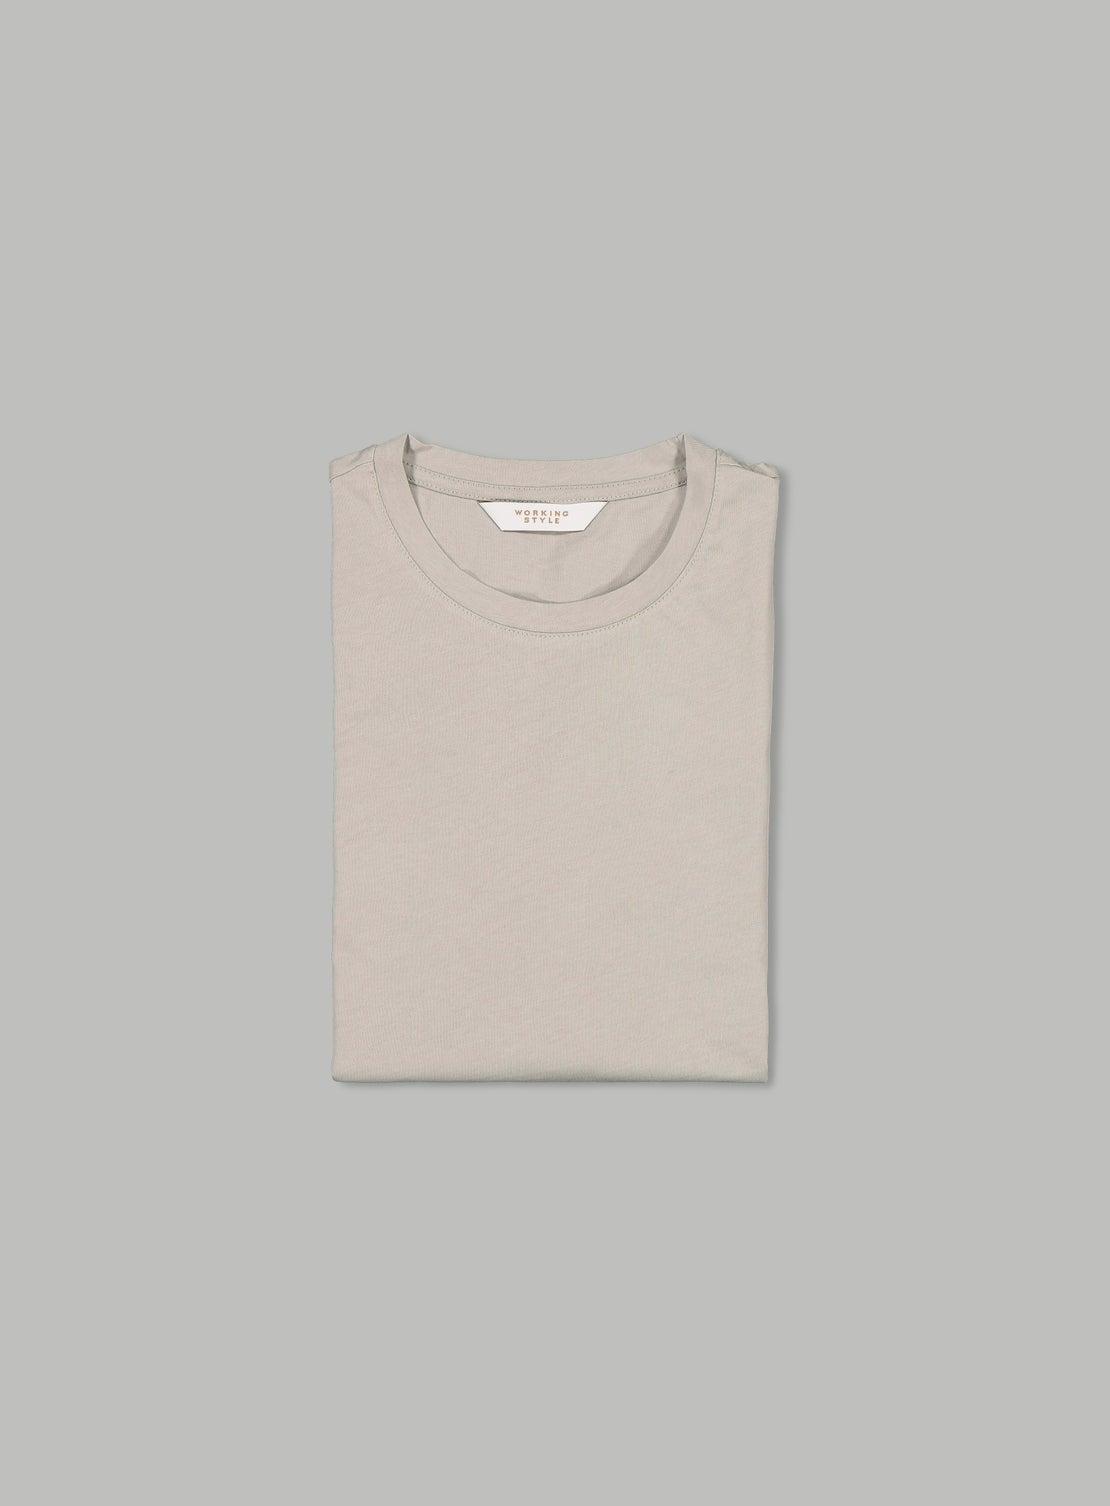 Benny Grey T-Shirt